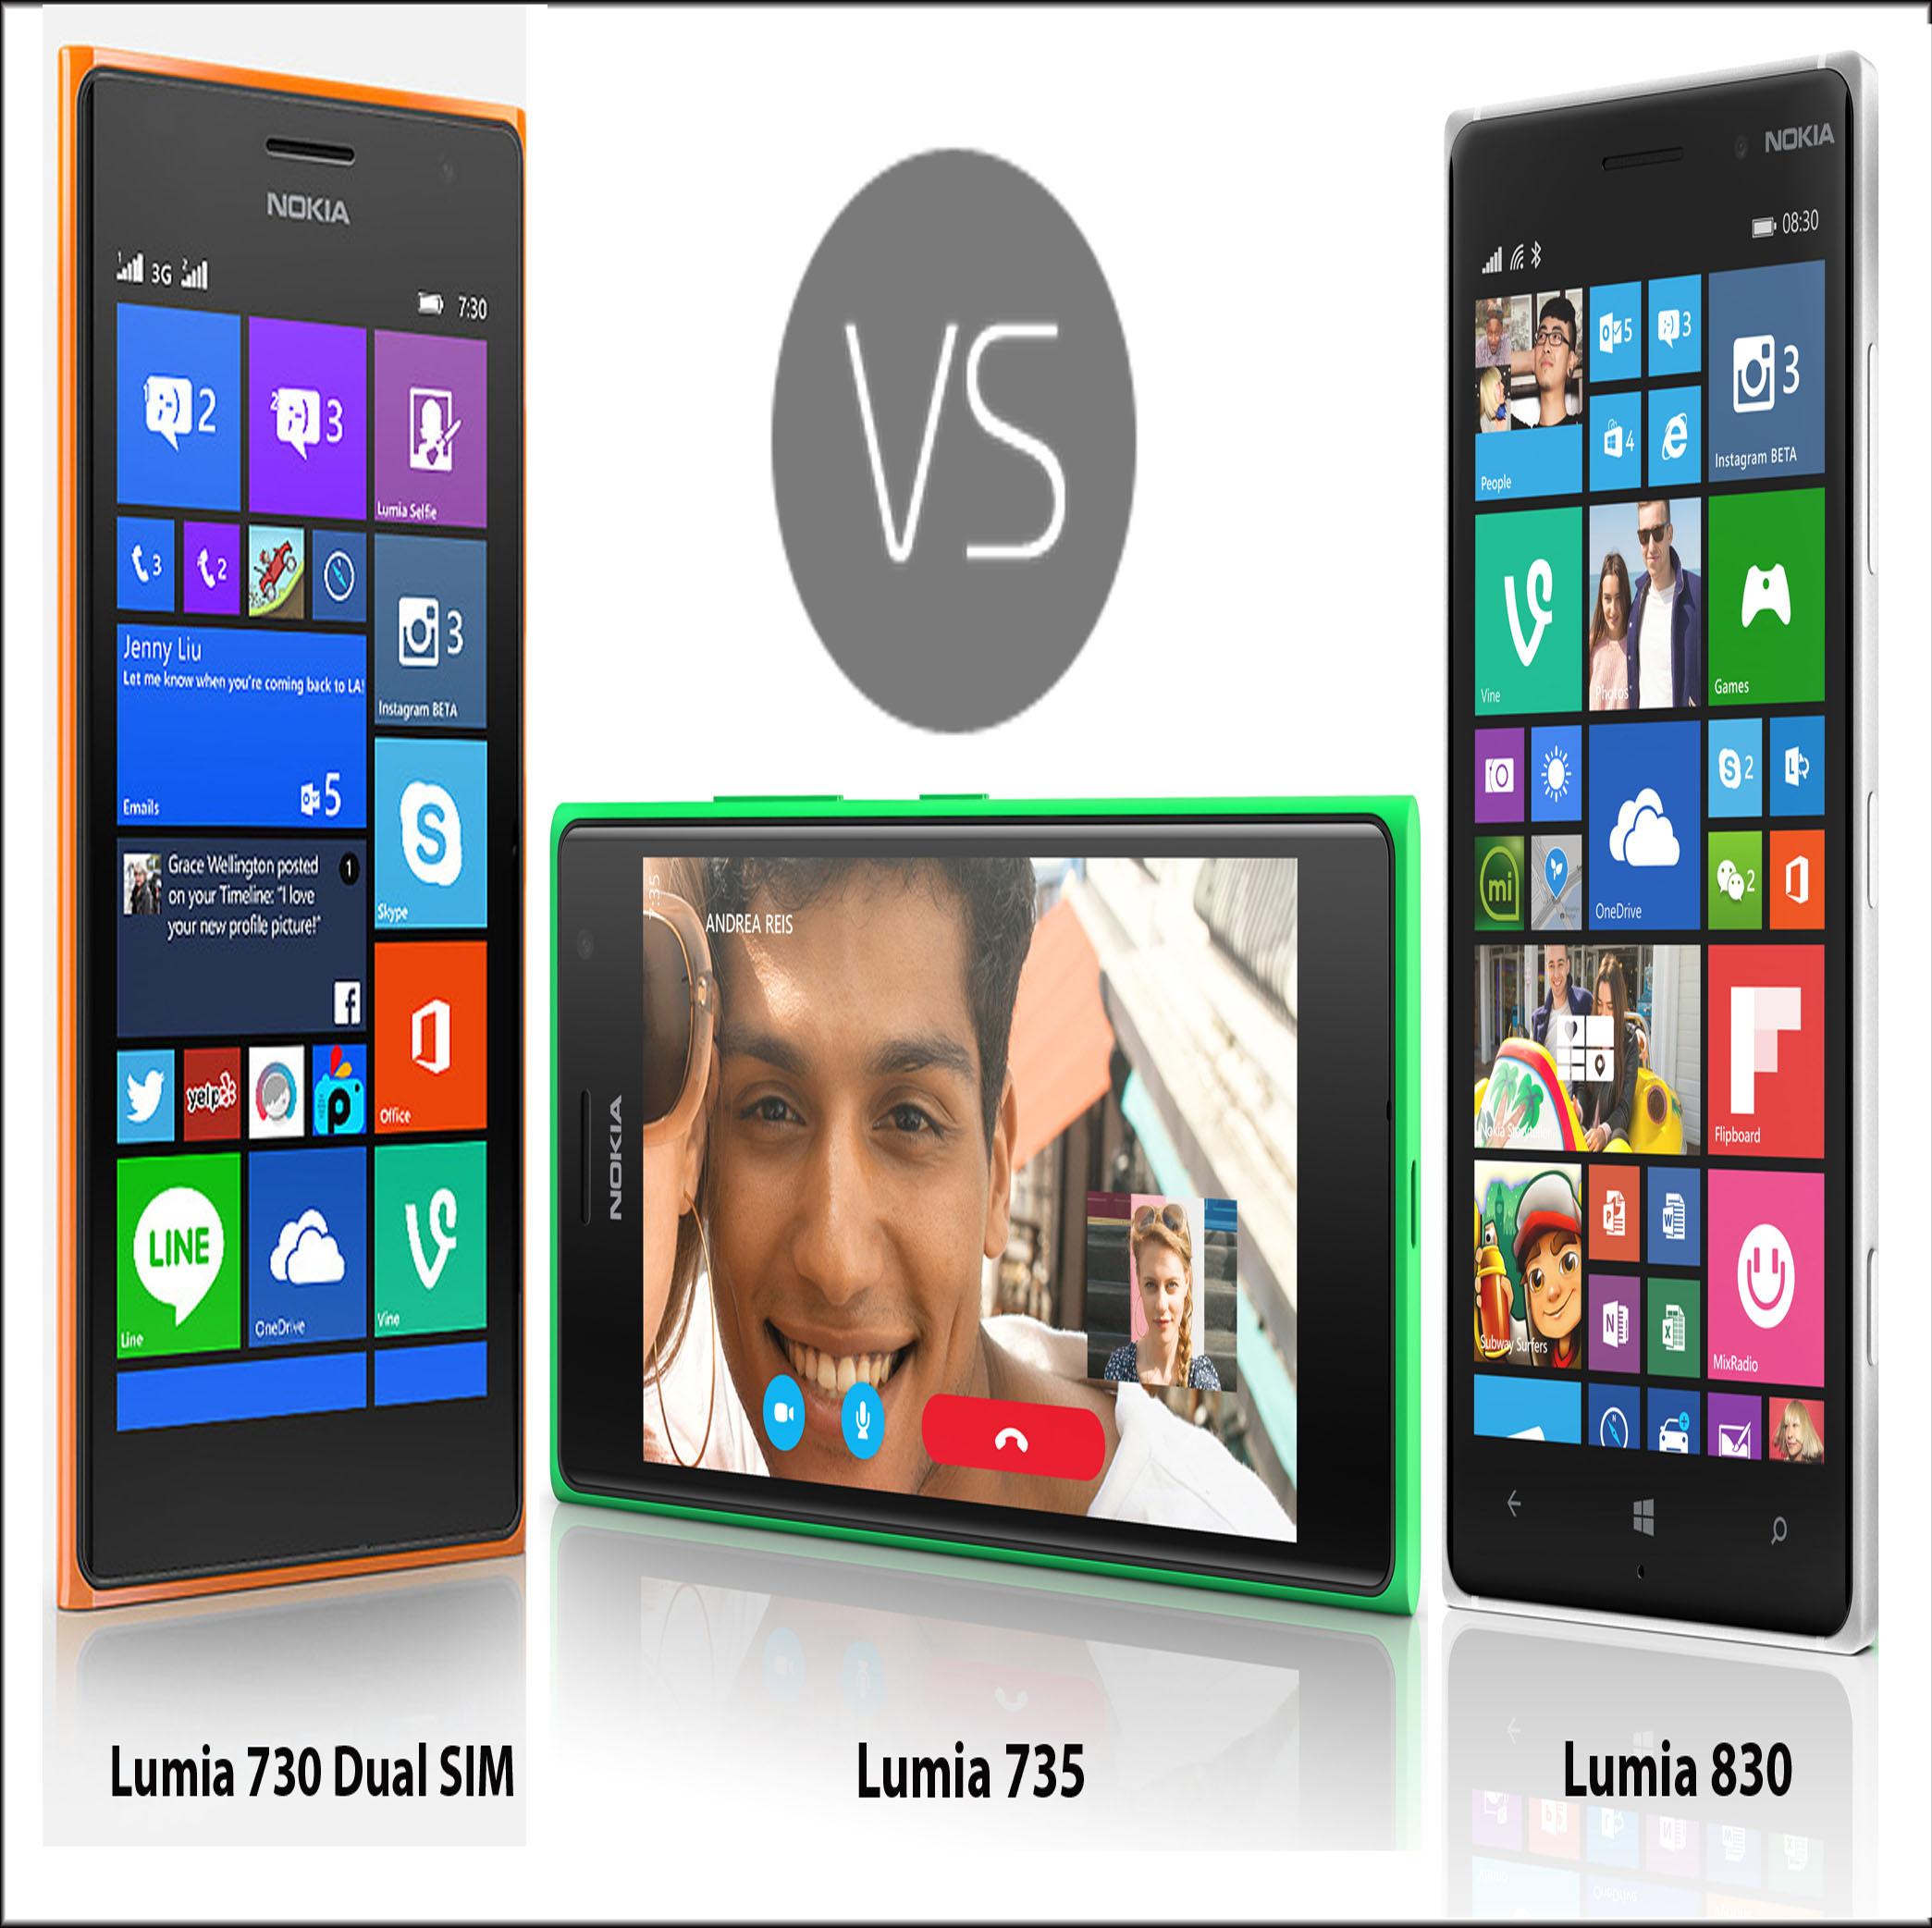 Nokia Lumia 730 vs Lumia 735 vs Lumia 830 Specs, Features ...